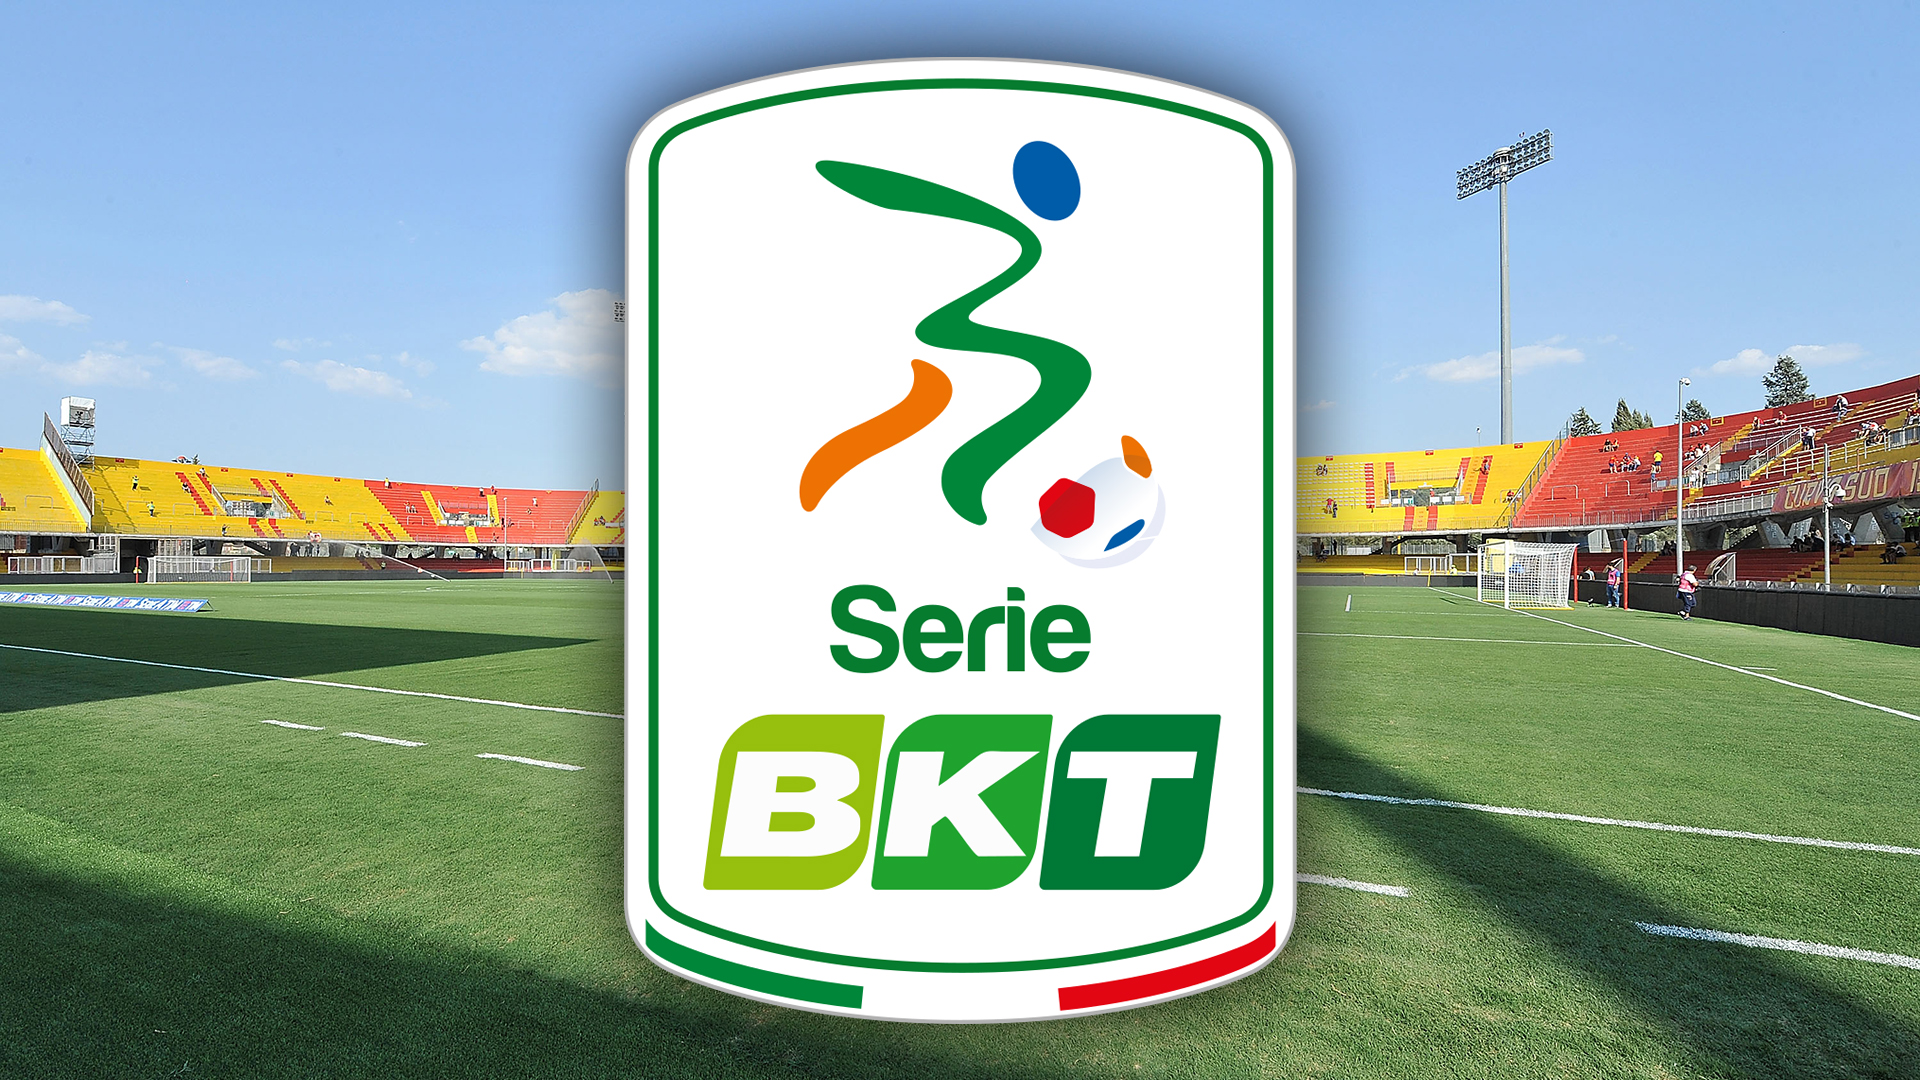 Calendario Play Off Serie B.Playoff Serie B 2019 Tabellone Calendario Date Orari